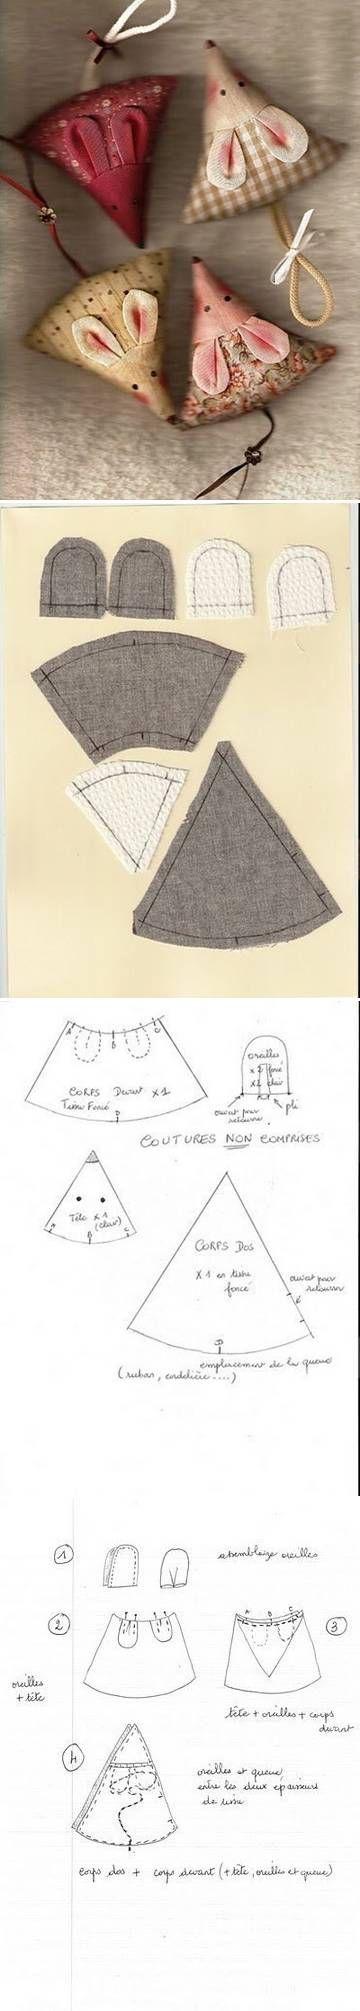 DIY Cute Fabric Mice | Ideen mit Stoffresten | Pinterest | Mäuse ...